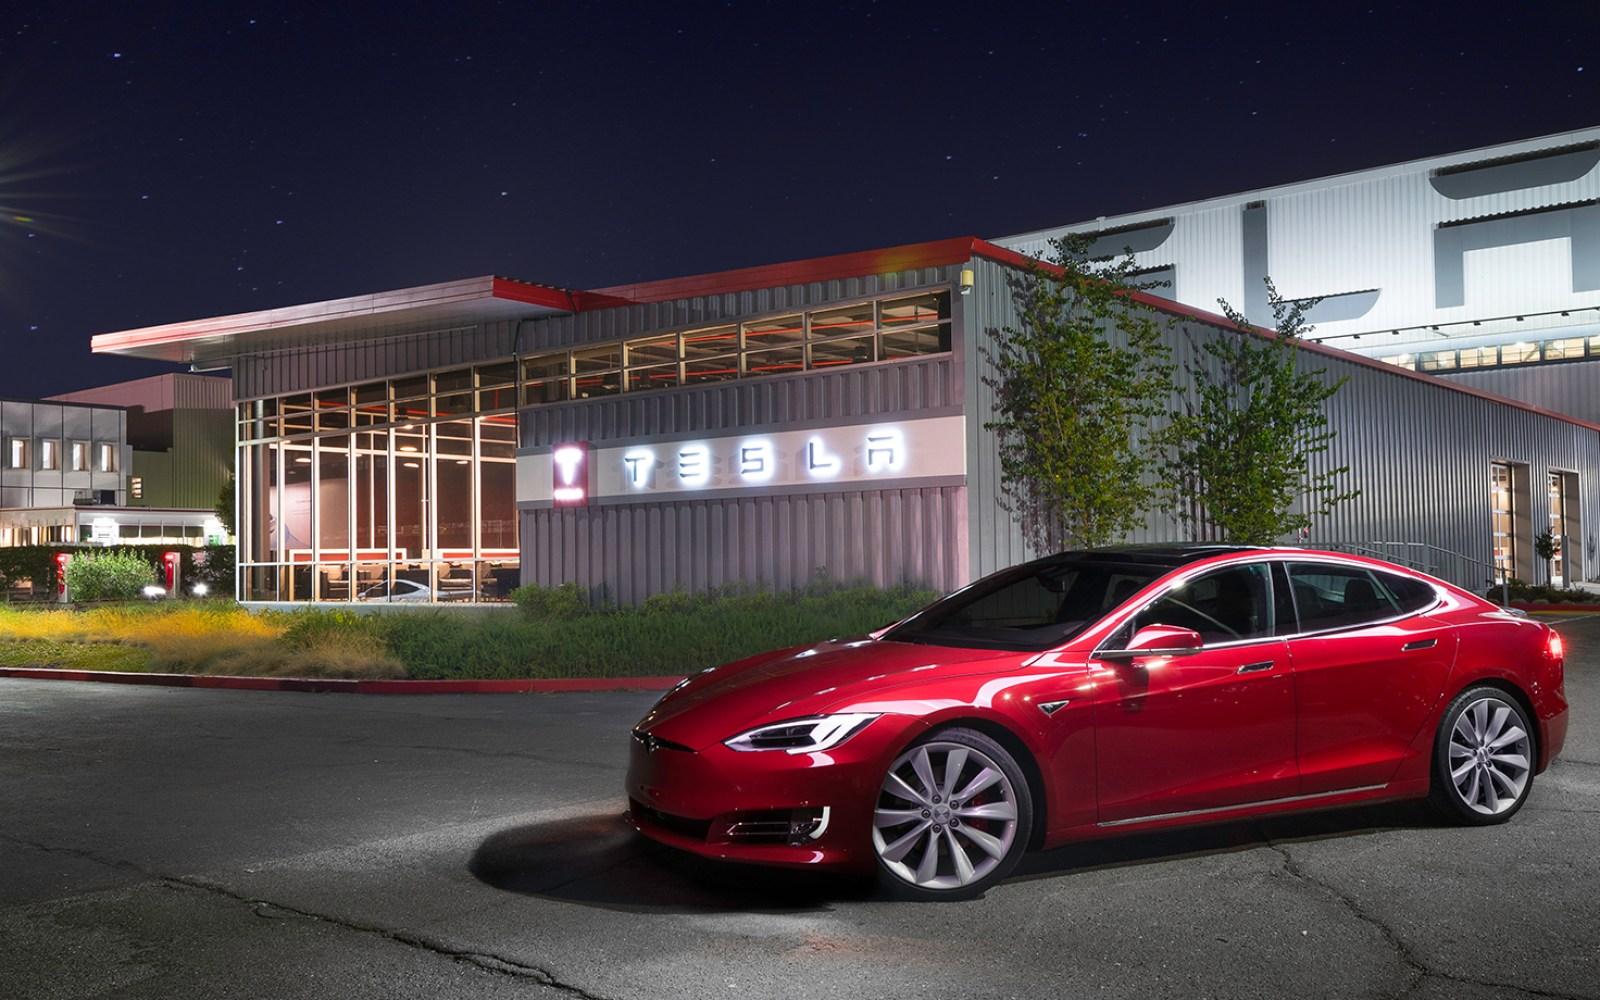 Tesla increases its lead on the US luxury sedan market, beating Mercedes, BMW and Audi